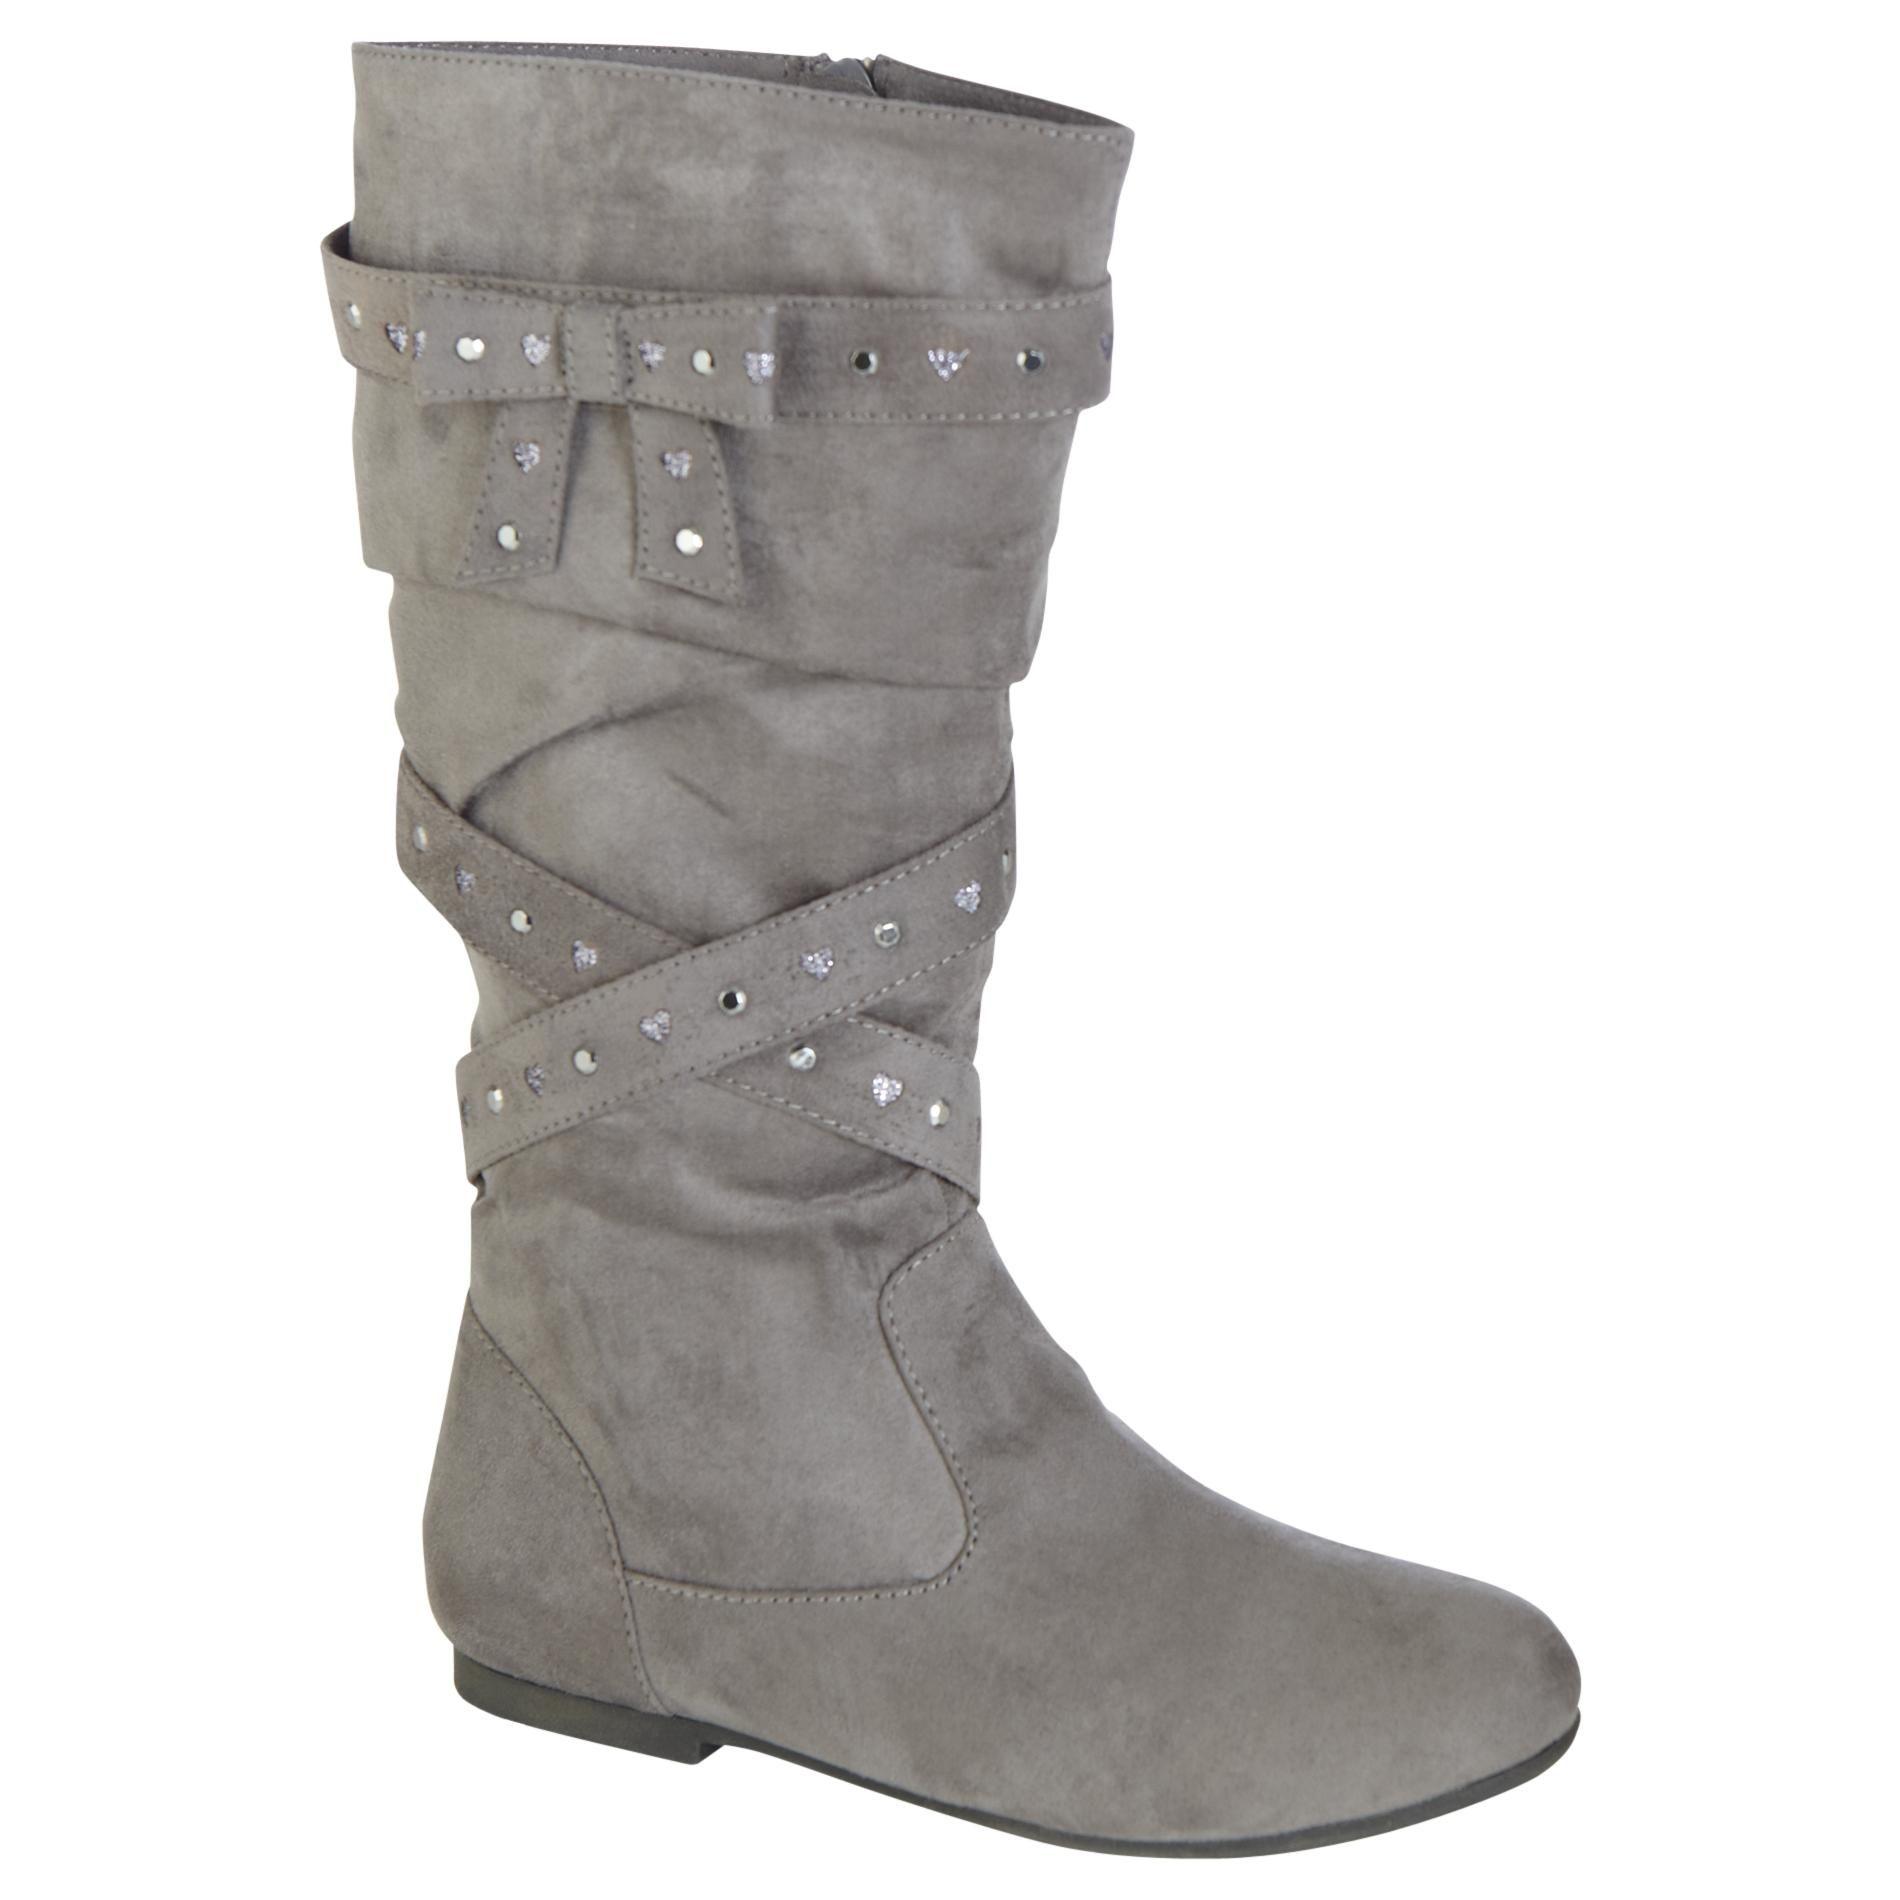 Grey Microsuede-Shoes-Girls Shoes-Girls